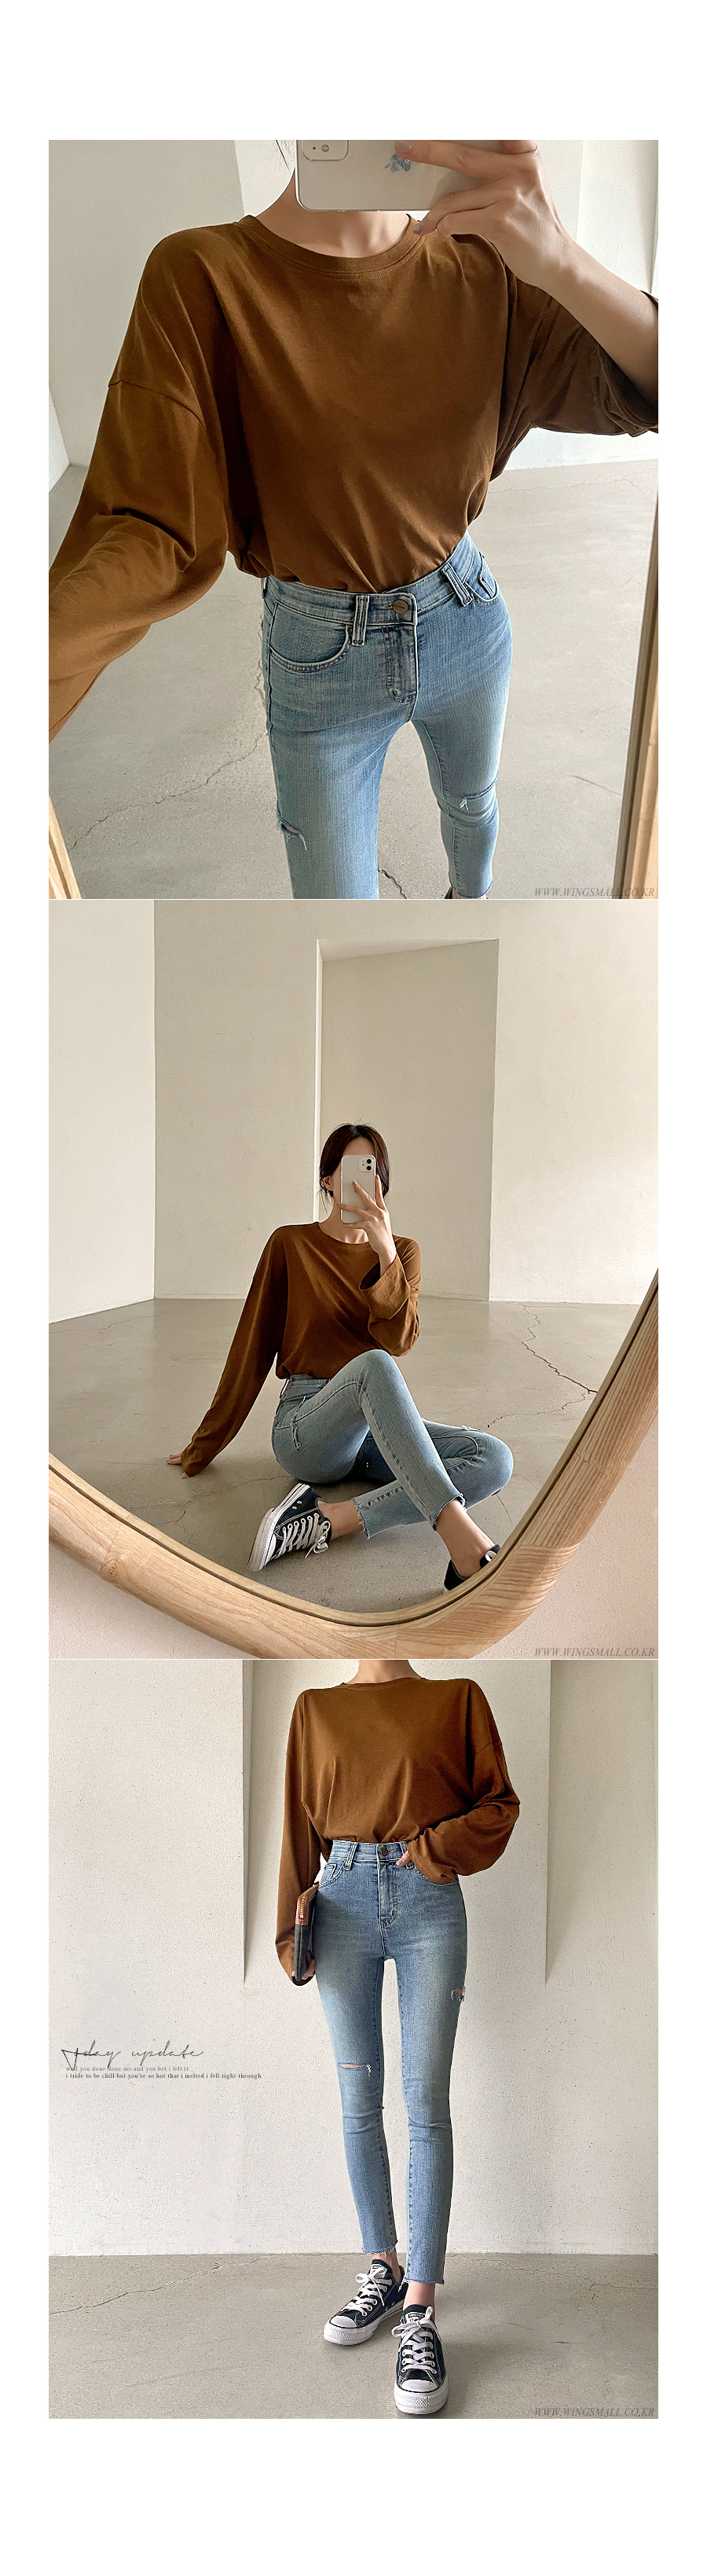 dress model image-S10L2